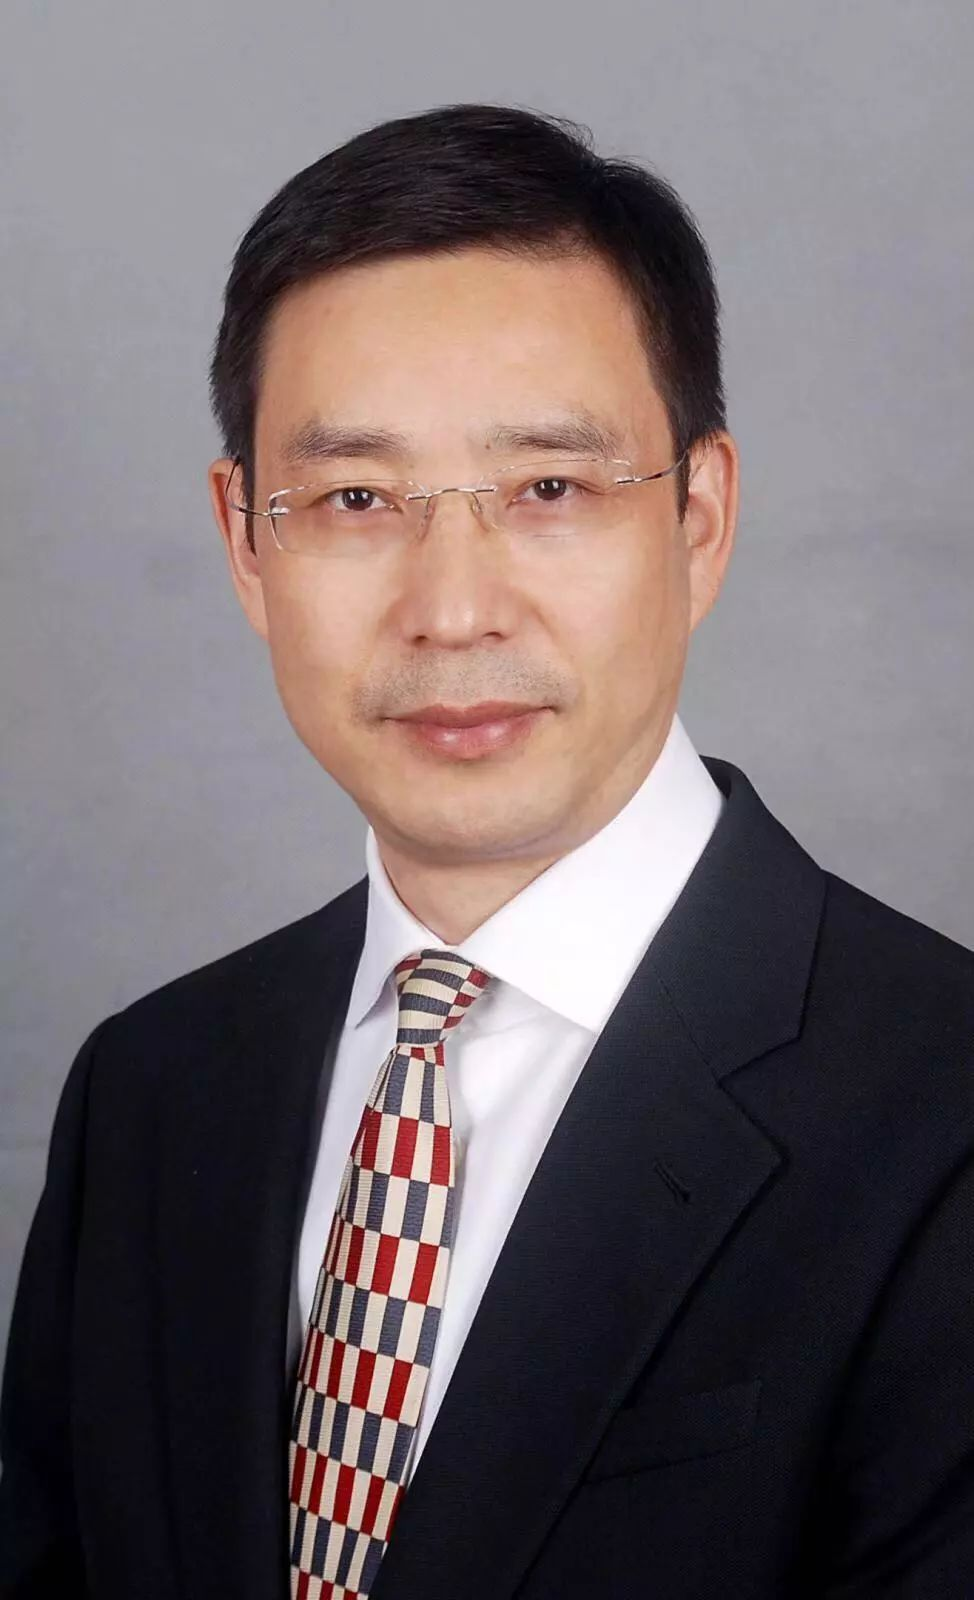 Via Licensing设立香港办事处!甘海兵担任中国区技术授权业务总经理